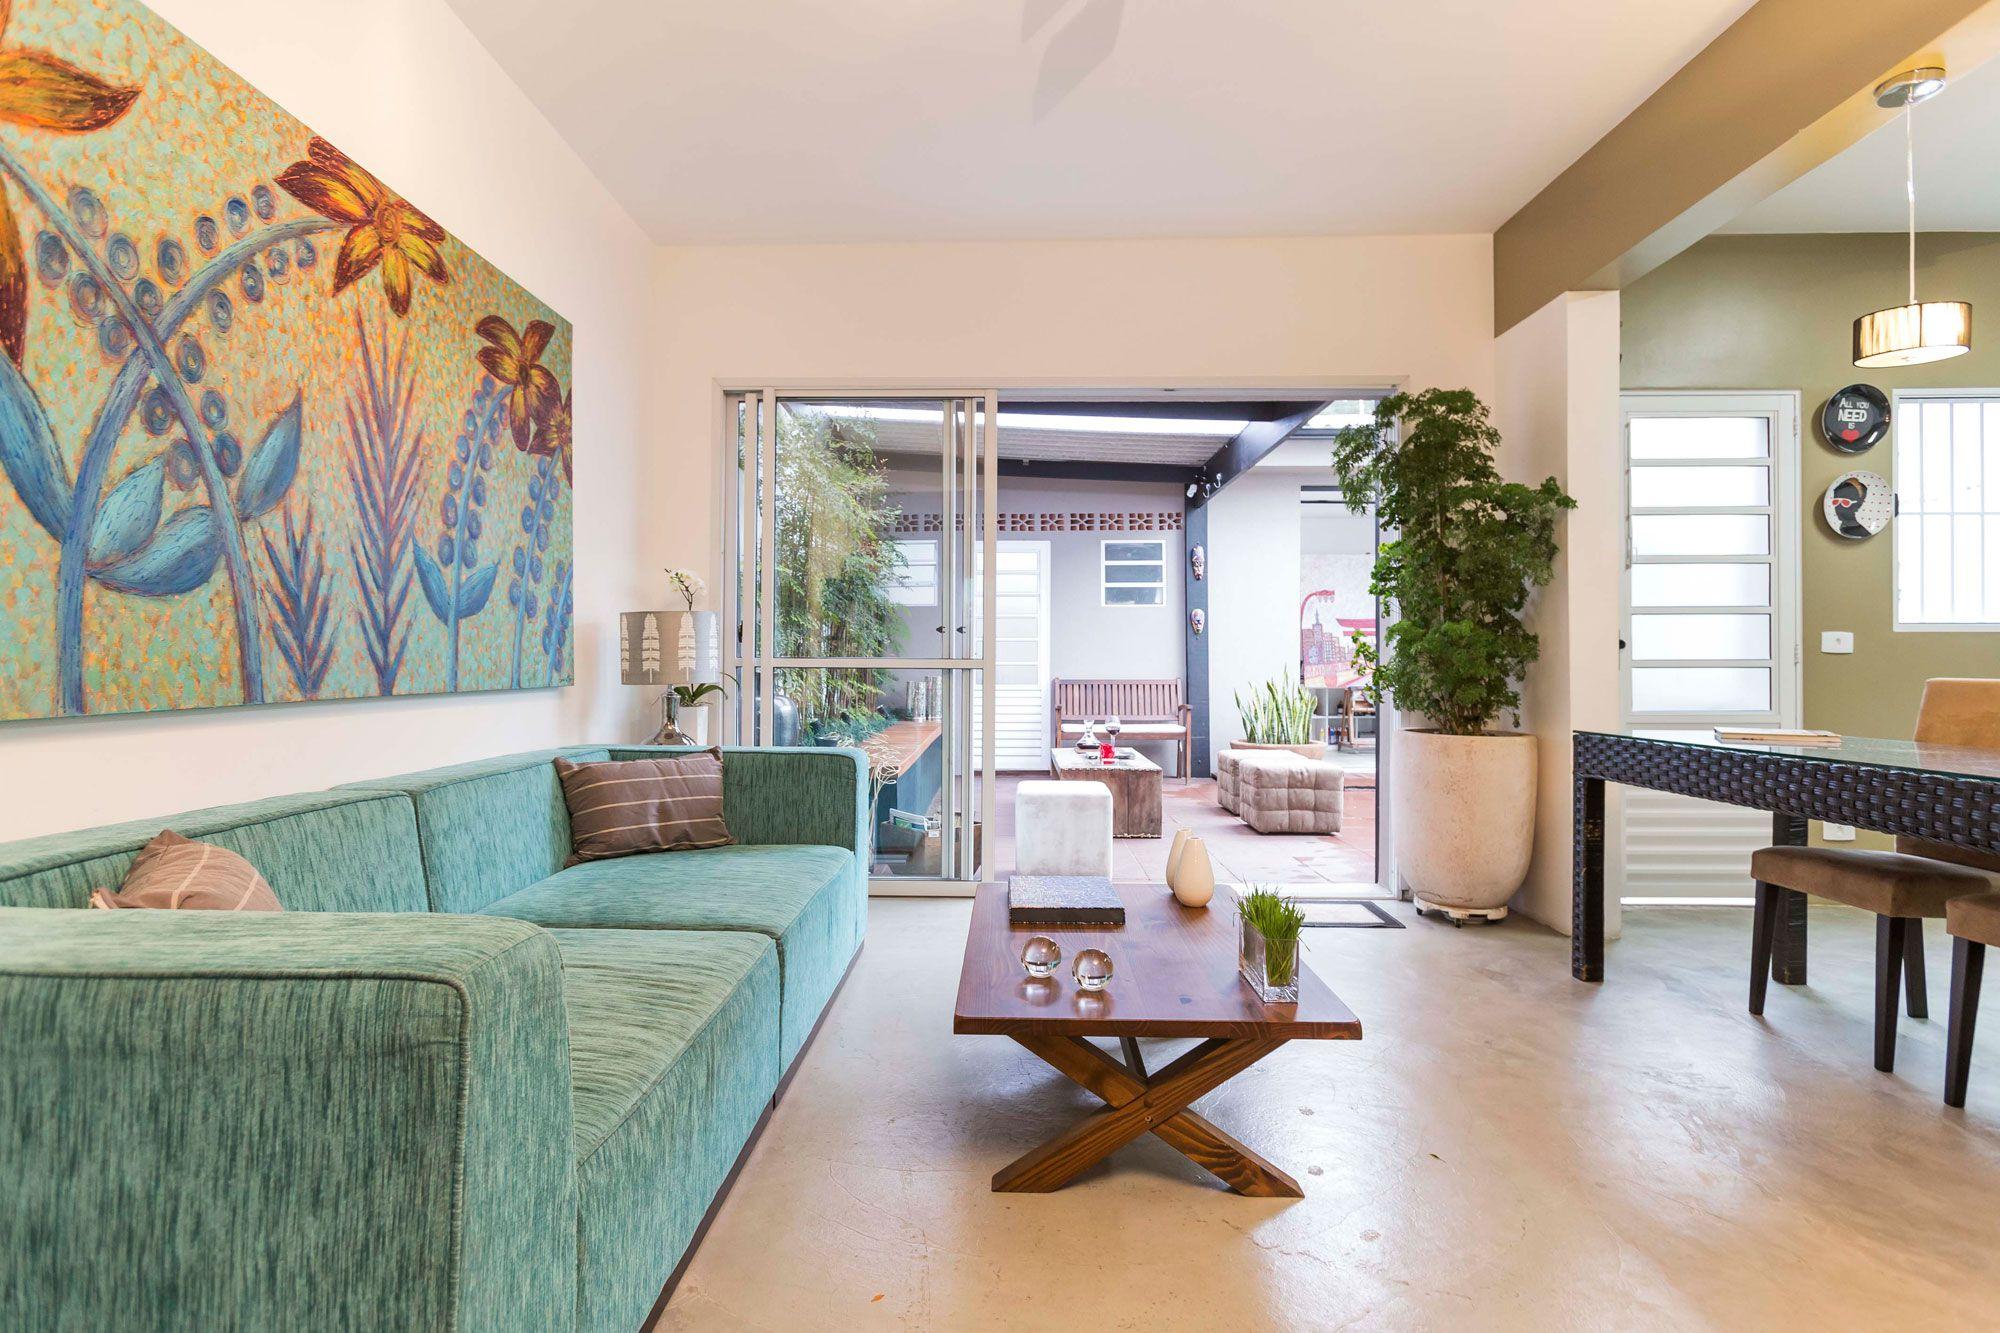 Granja-Julieta-Residence-17